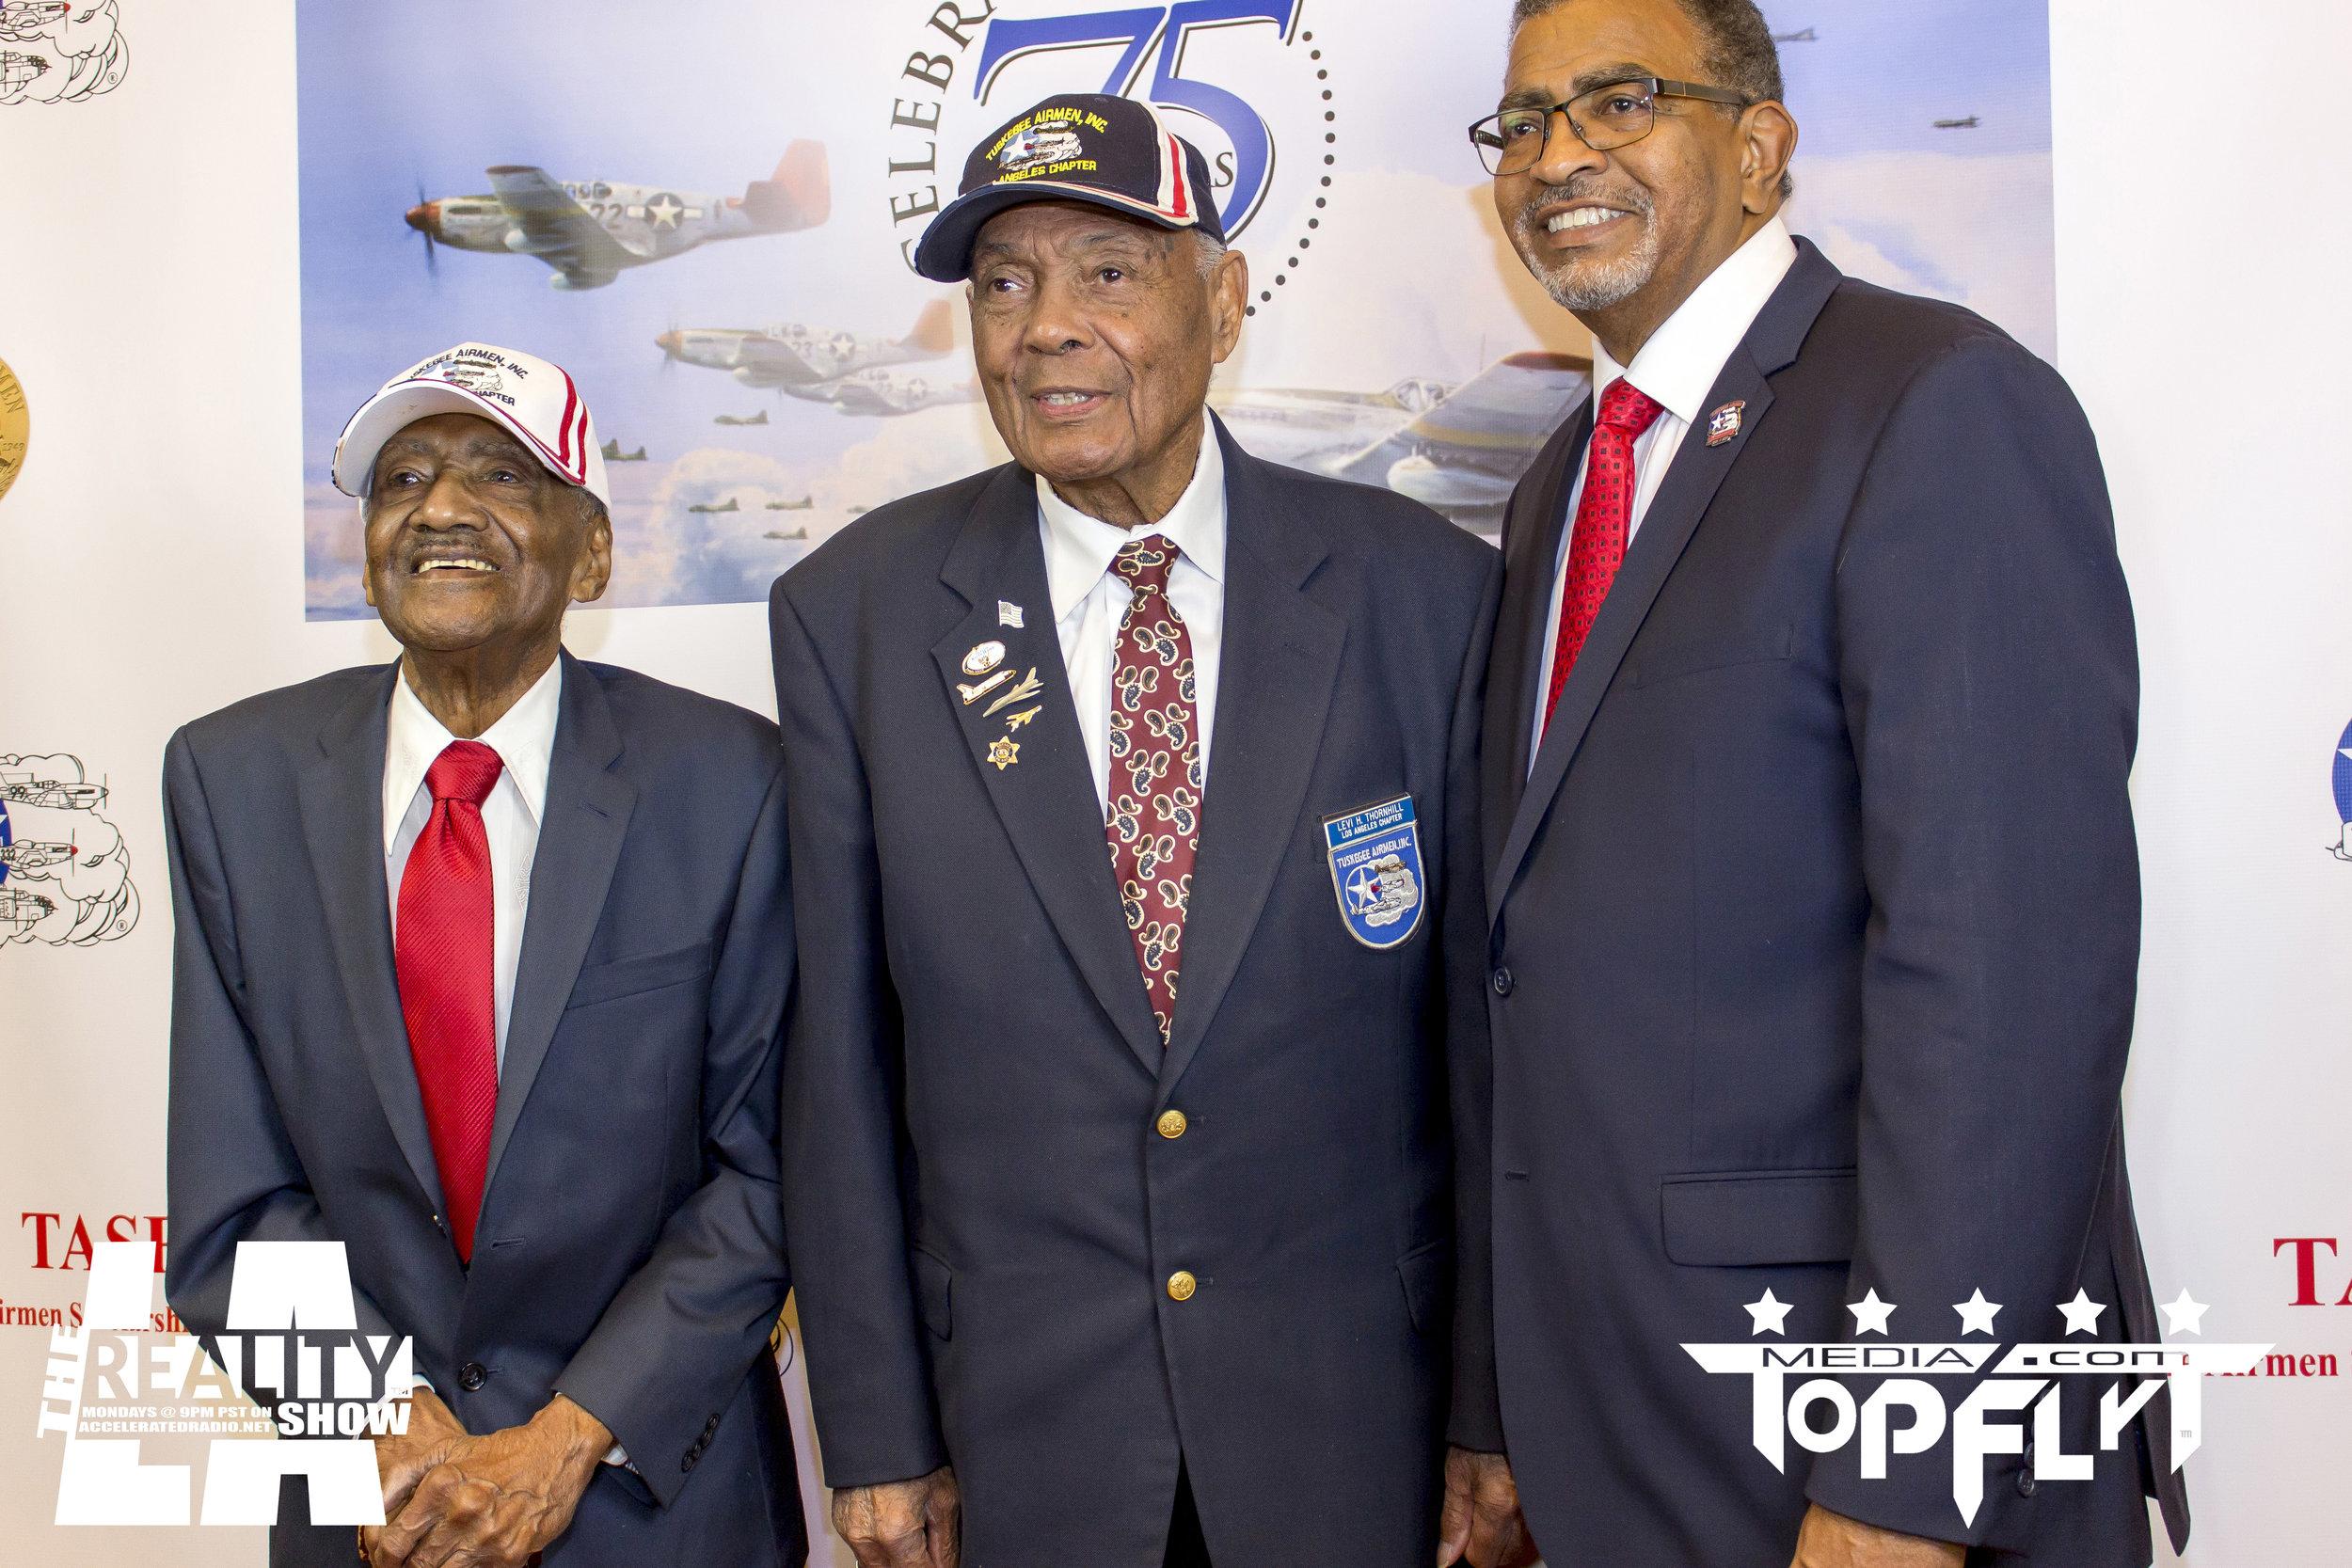 The Reality Show LA - Tuskegee Airmen 75th Anniversary VIP Reception_22.jpg